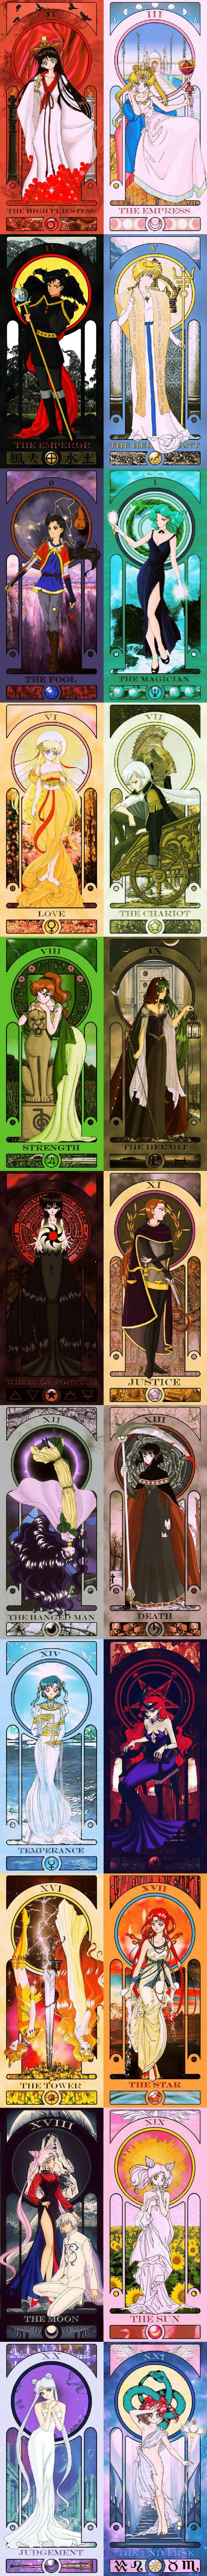 ... whoa! Imagine using these as an attack or summons? Oooooo. *ponders-*   Sailor Moon Tarot cards